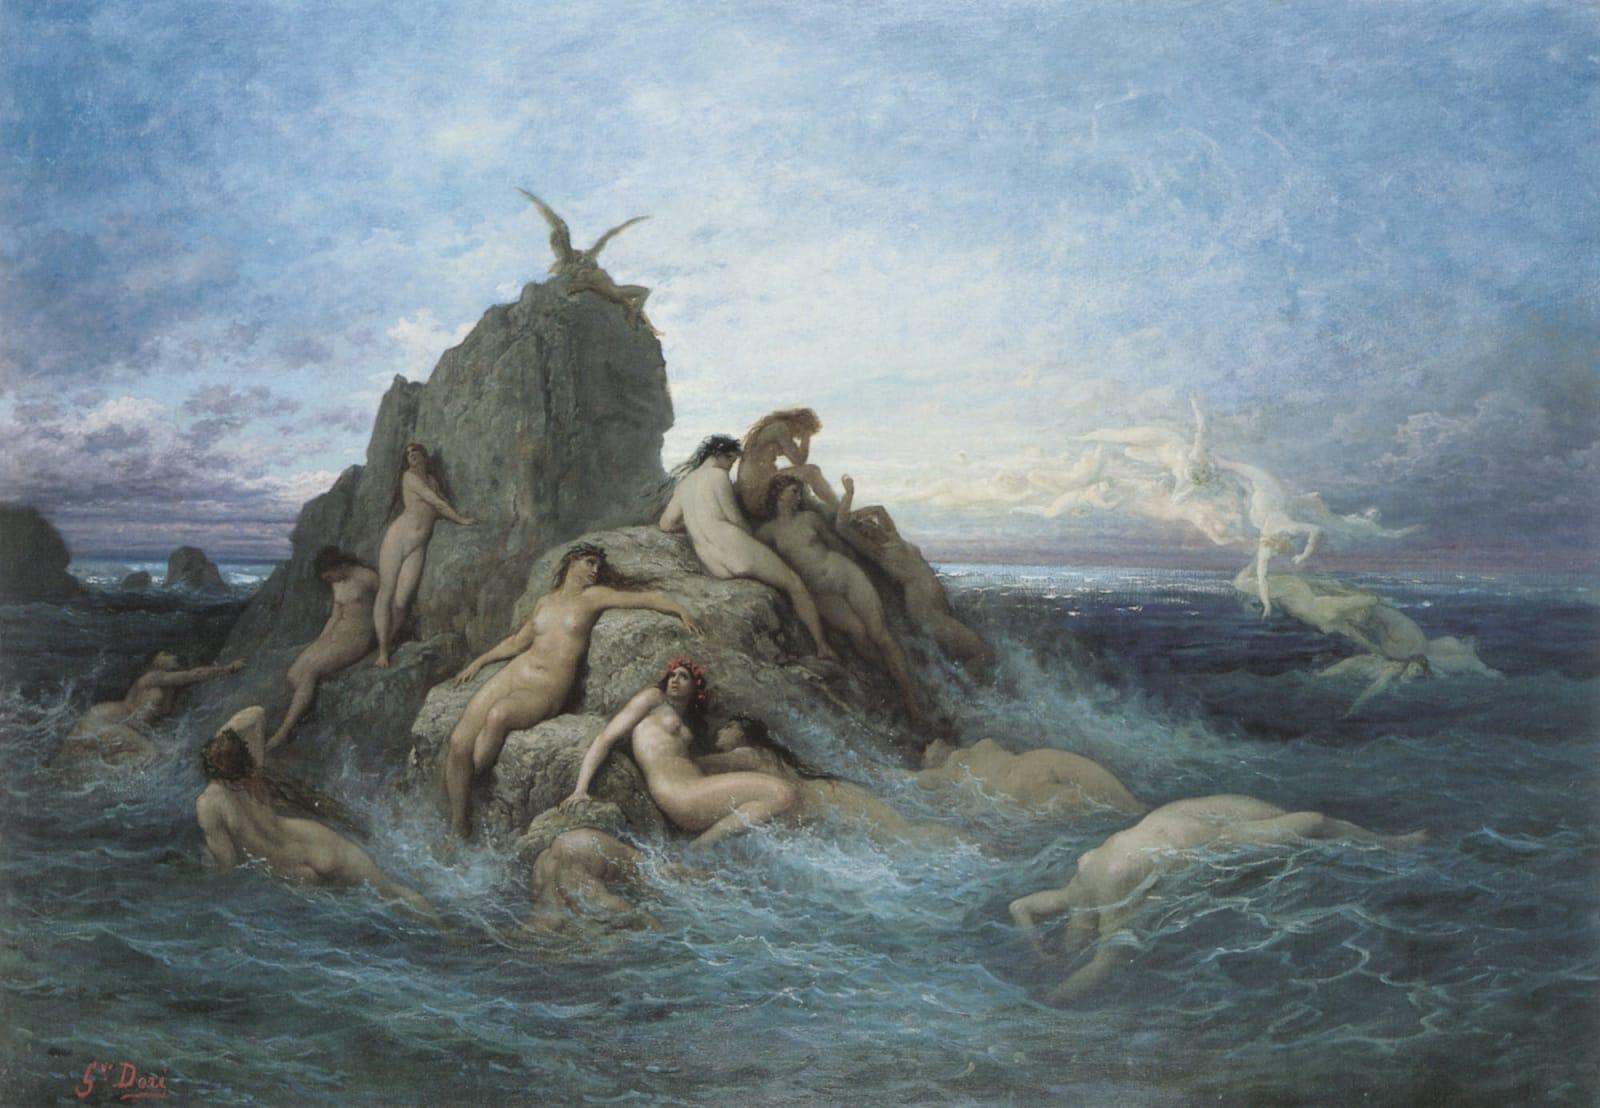 Gustave Doré, Les Océanides (Les Naiades de la mer), c. 1860s